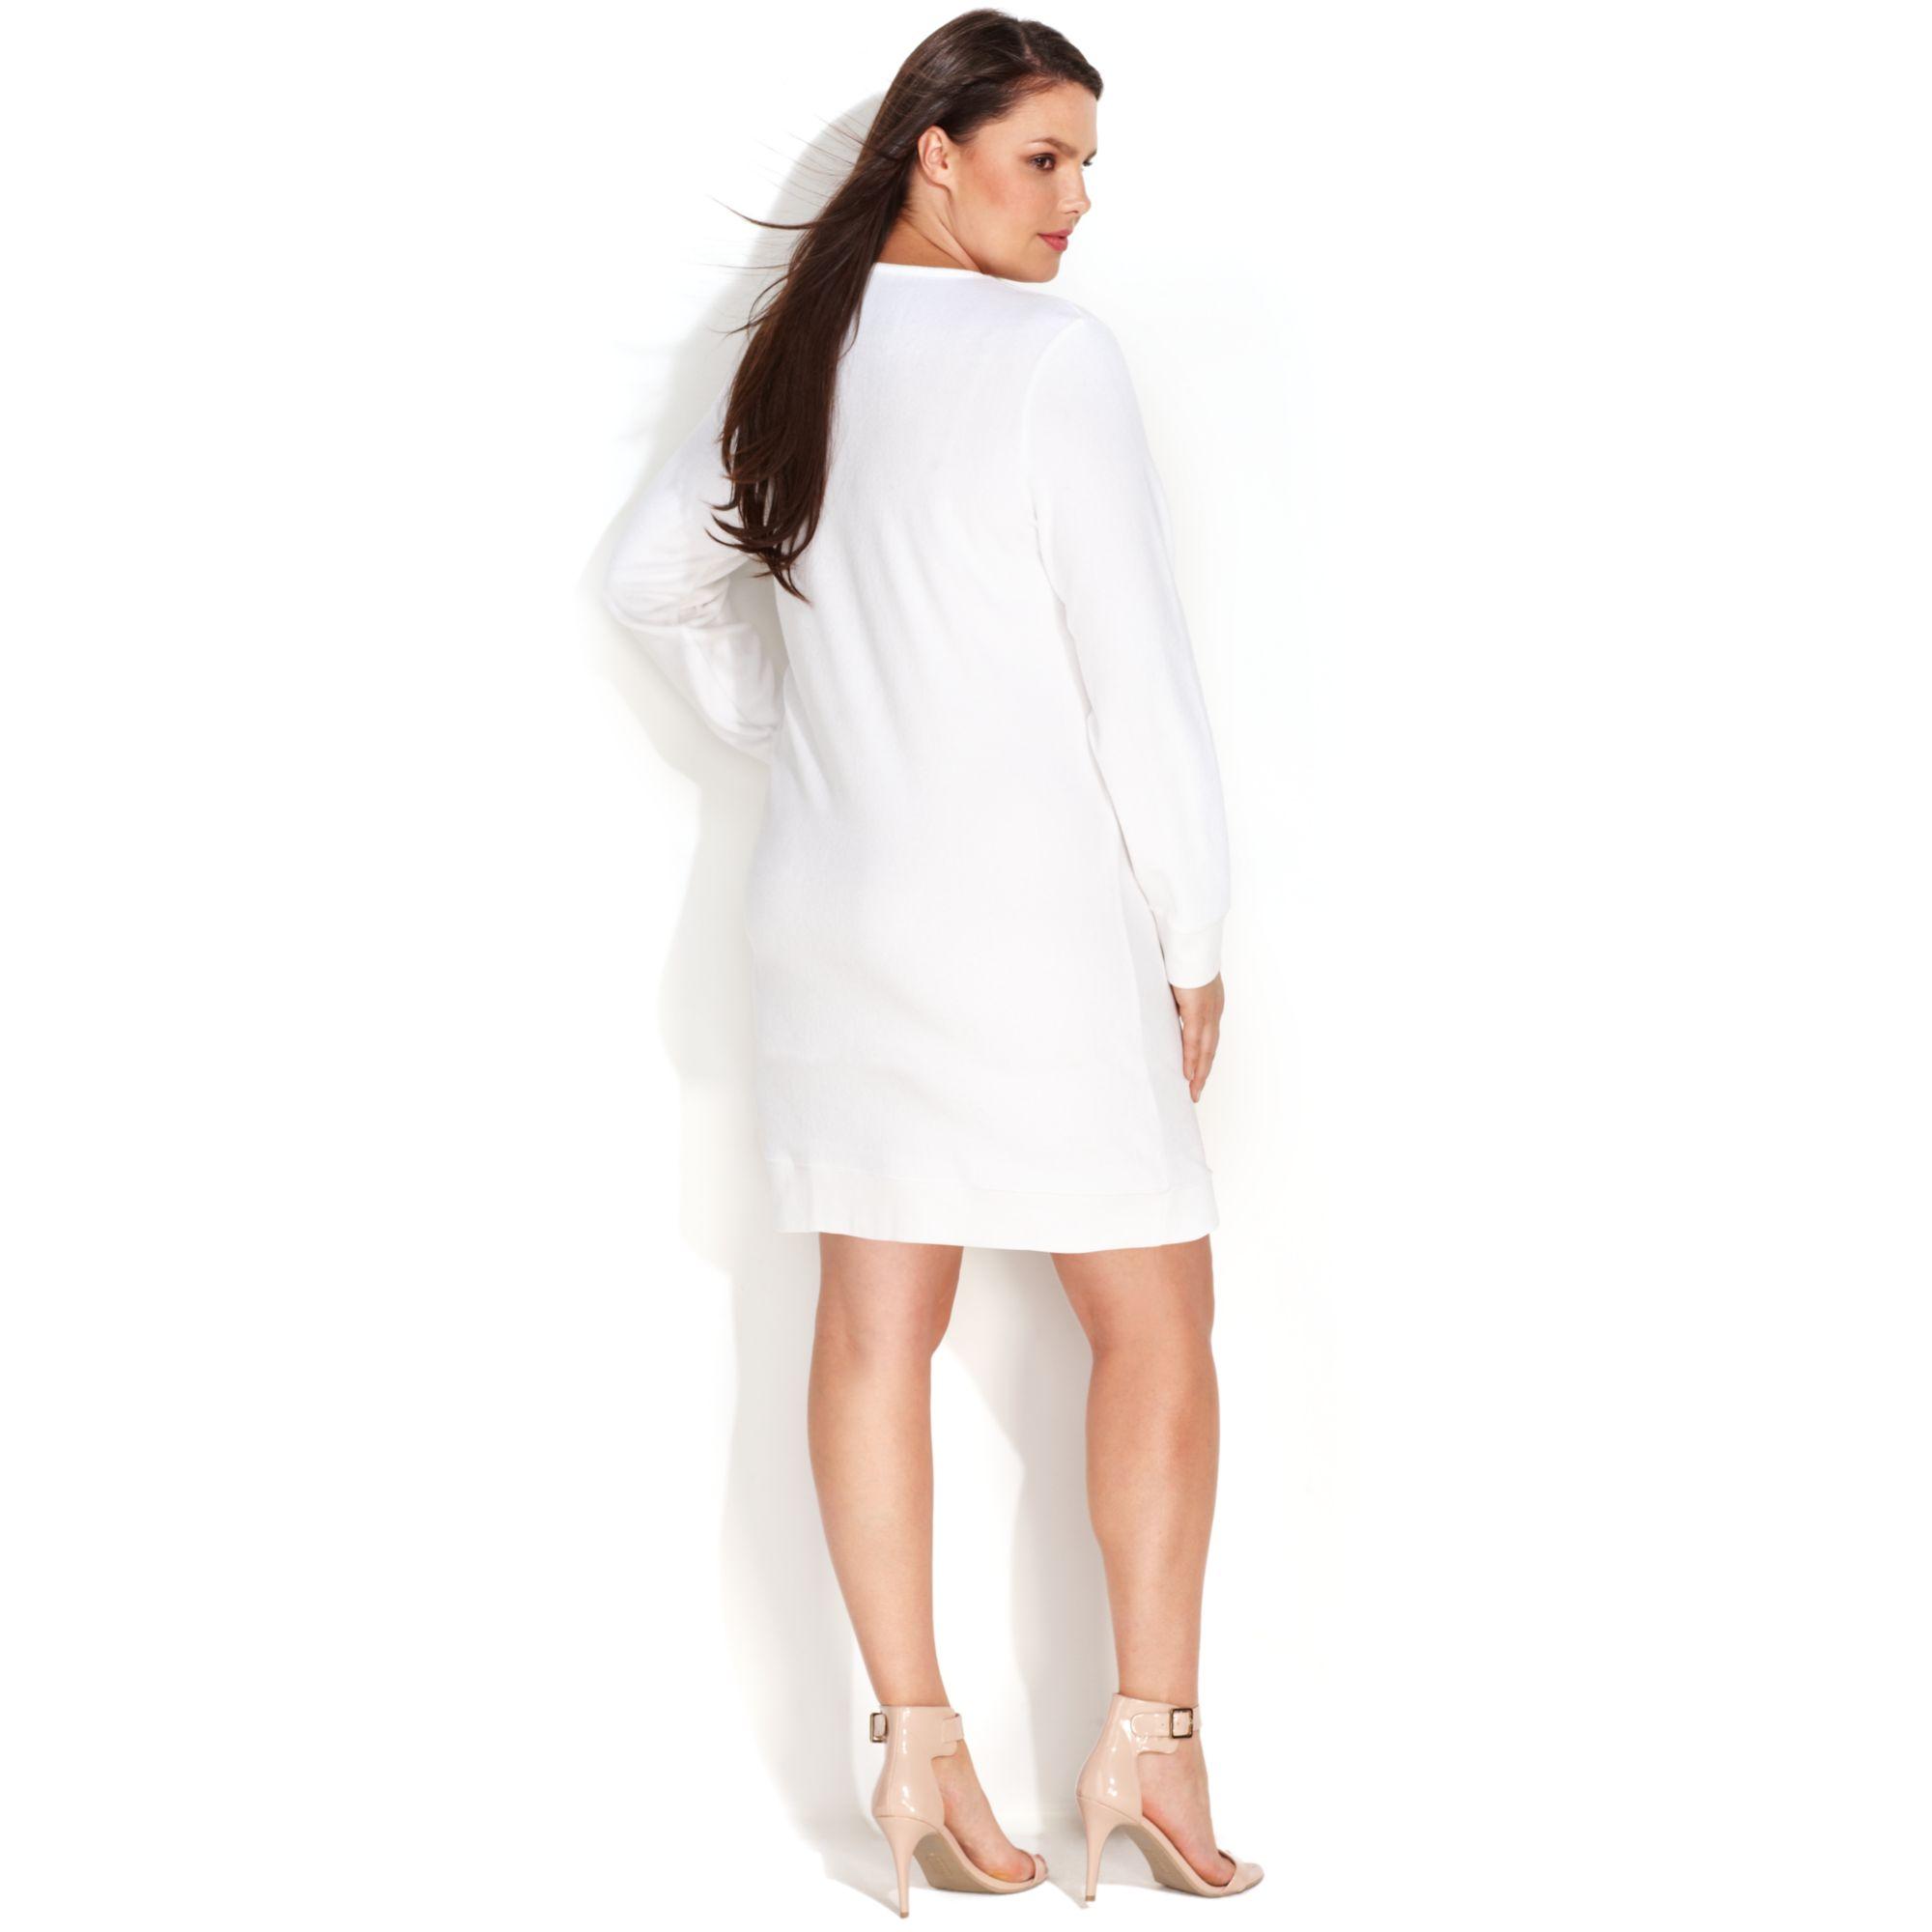 Casual White Dress Plus Size